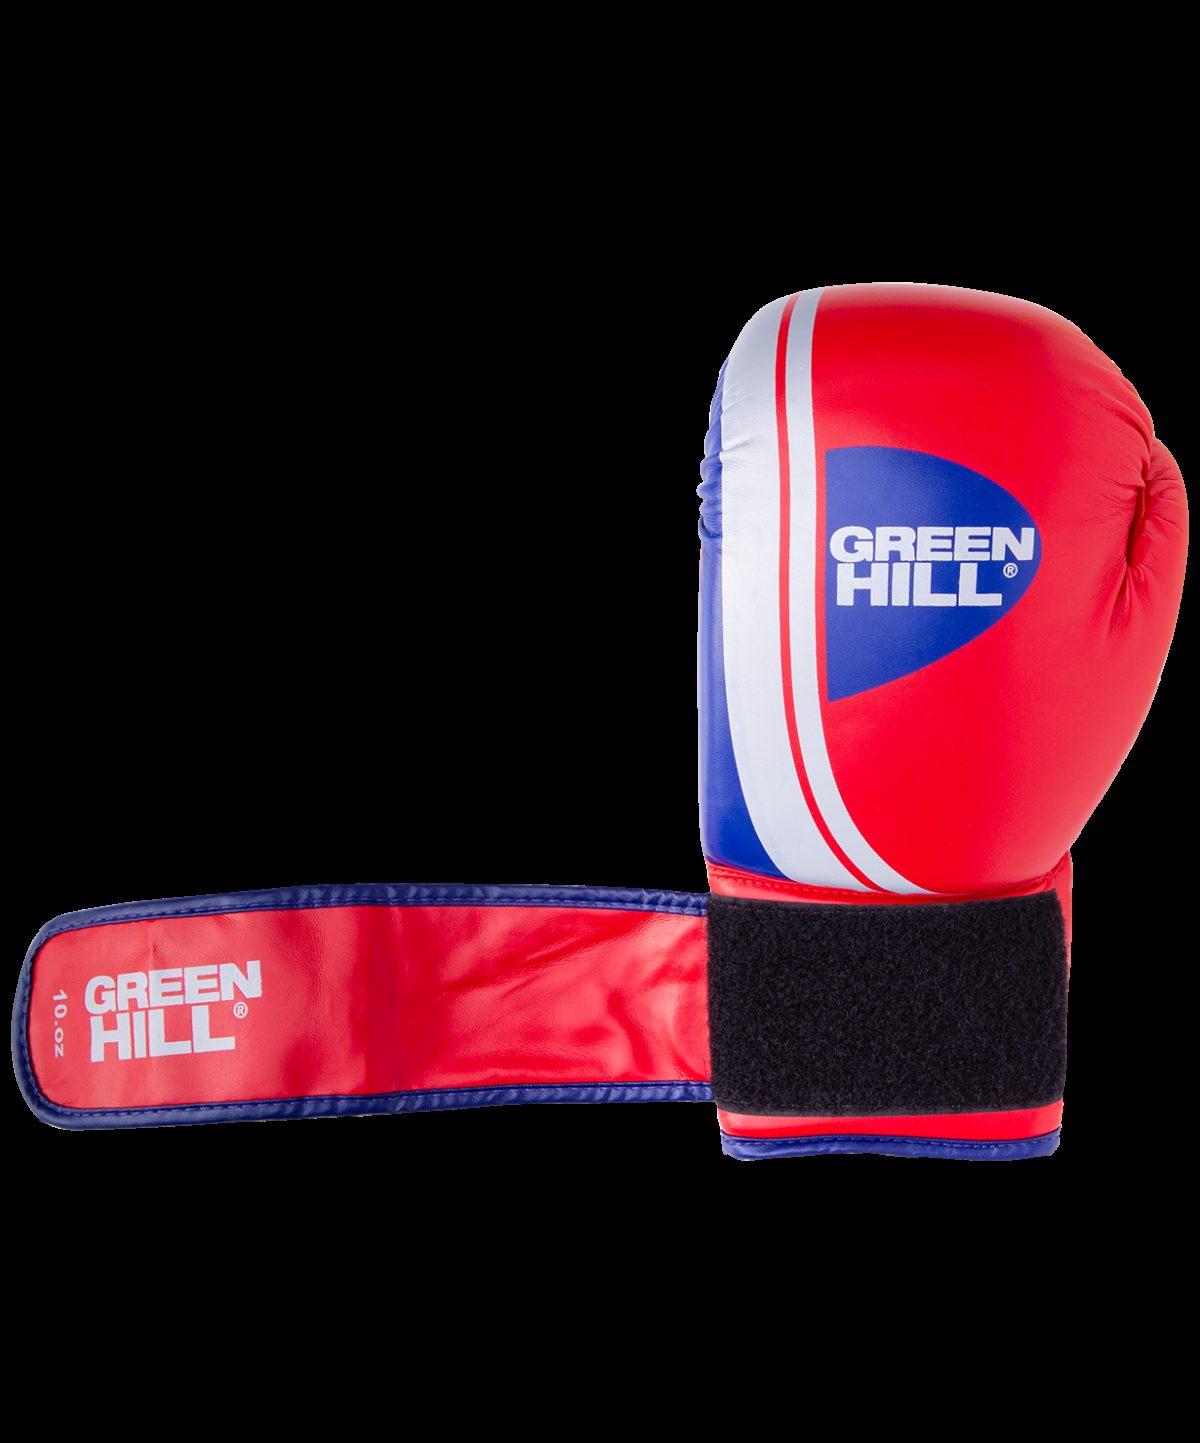 GREEN HILL Перчатки боксерские 10 oz Knockout  BGK-2266: красный - 4